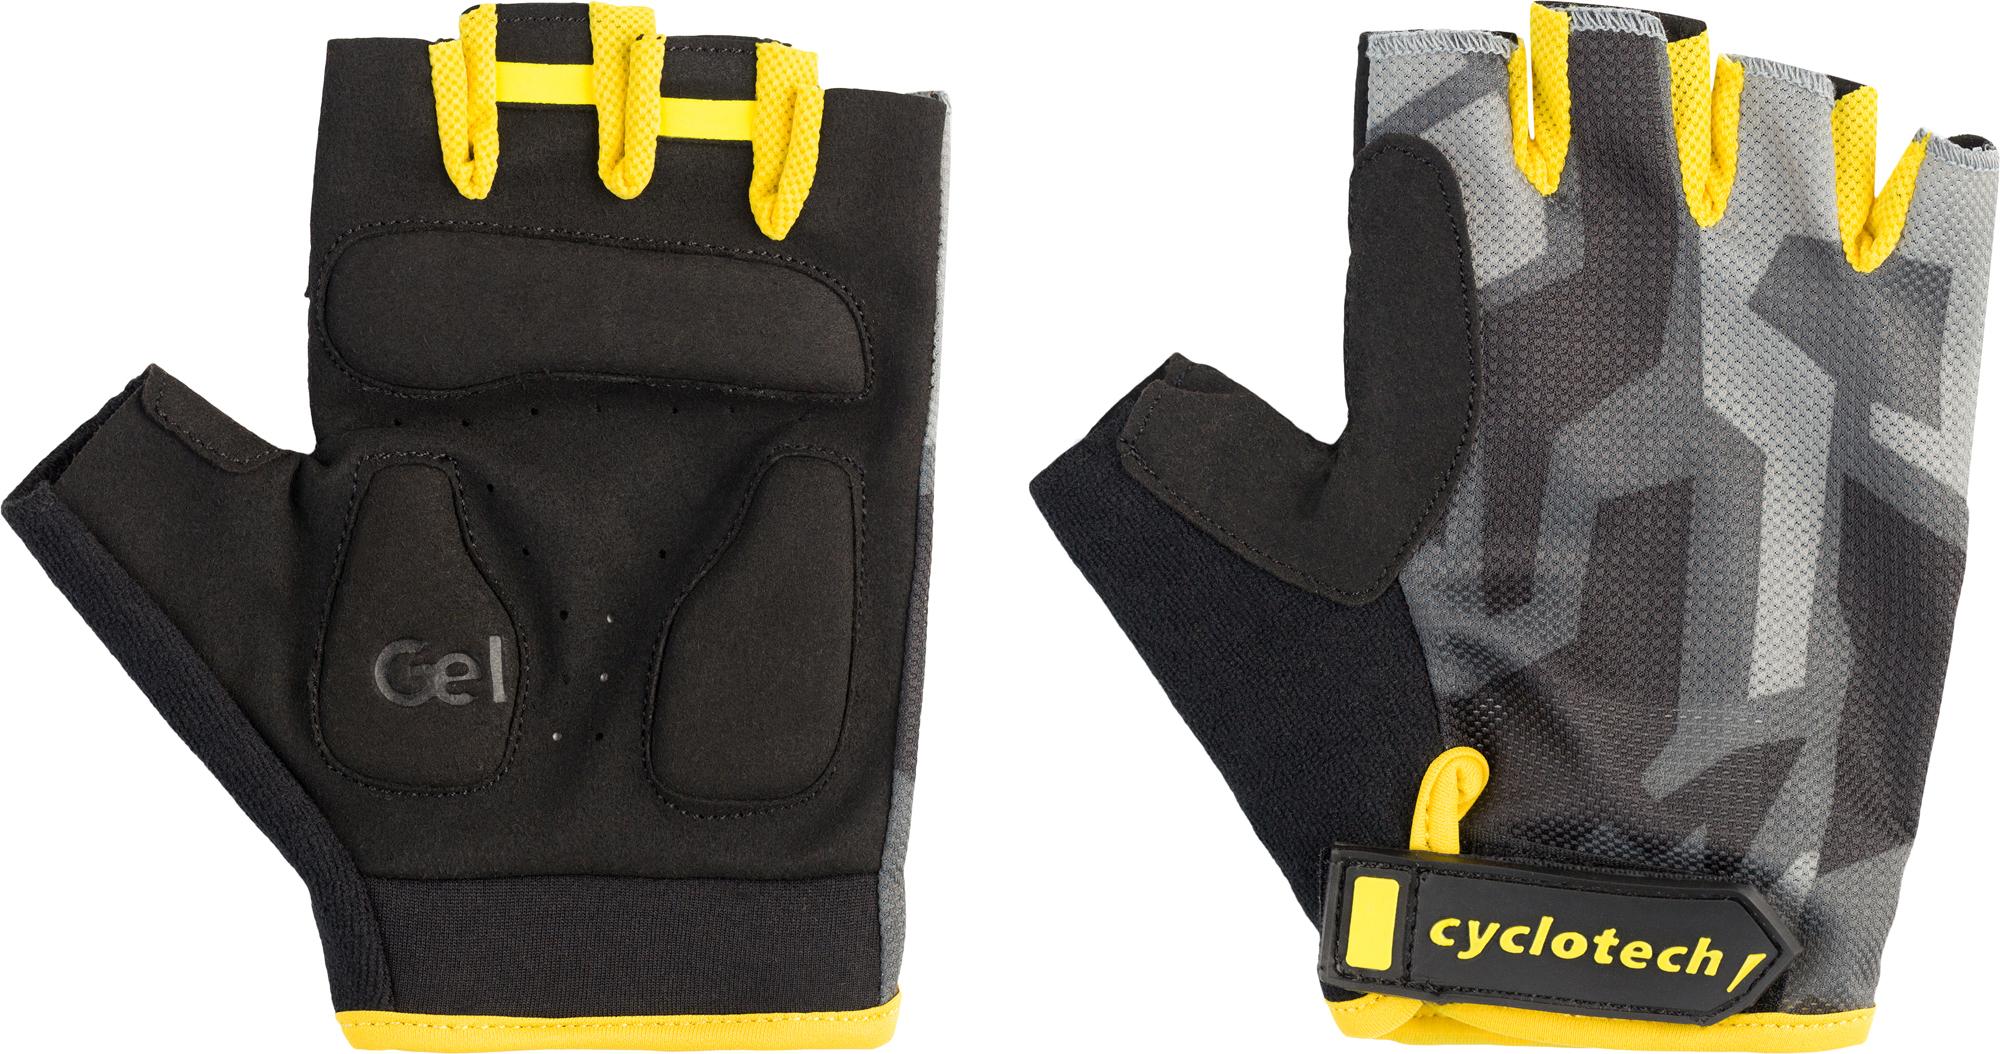 Cyclotech Перчатки велосипедные Cyclotech Razor cyclotech выжимка цепи cyclotech